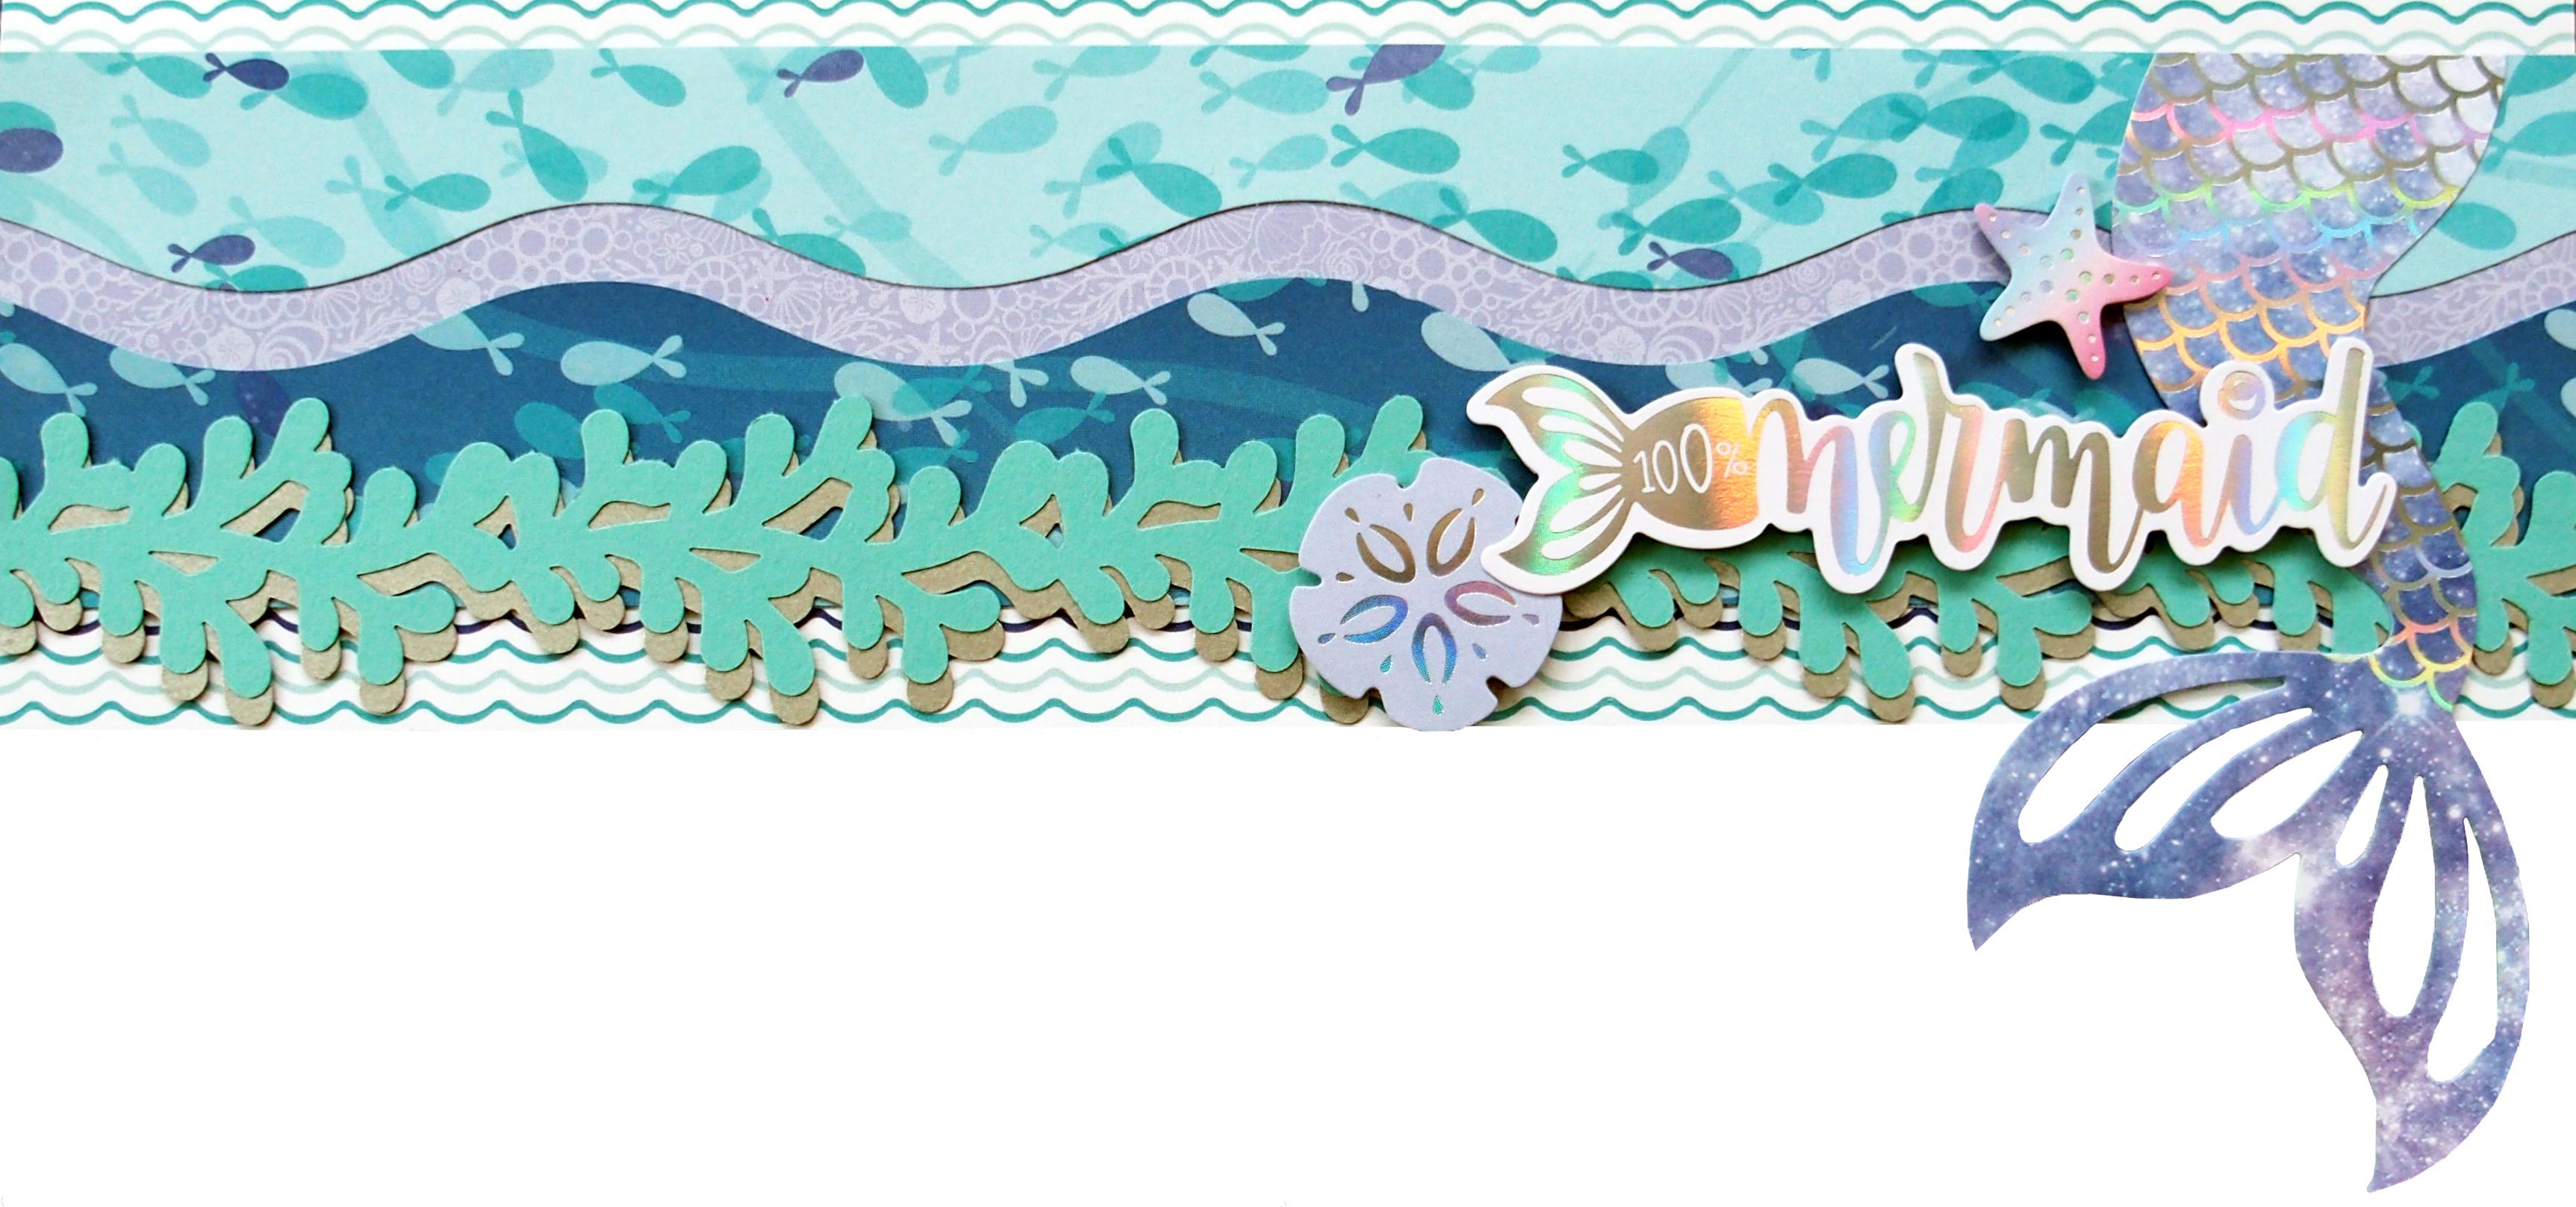 Mermaid-Cove-Collection-Scrapbooking-Borders-Creative-Memories-3